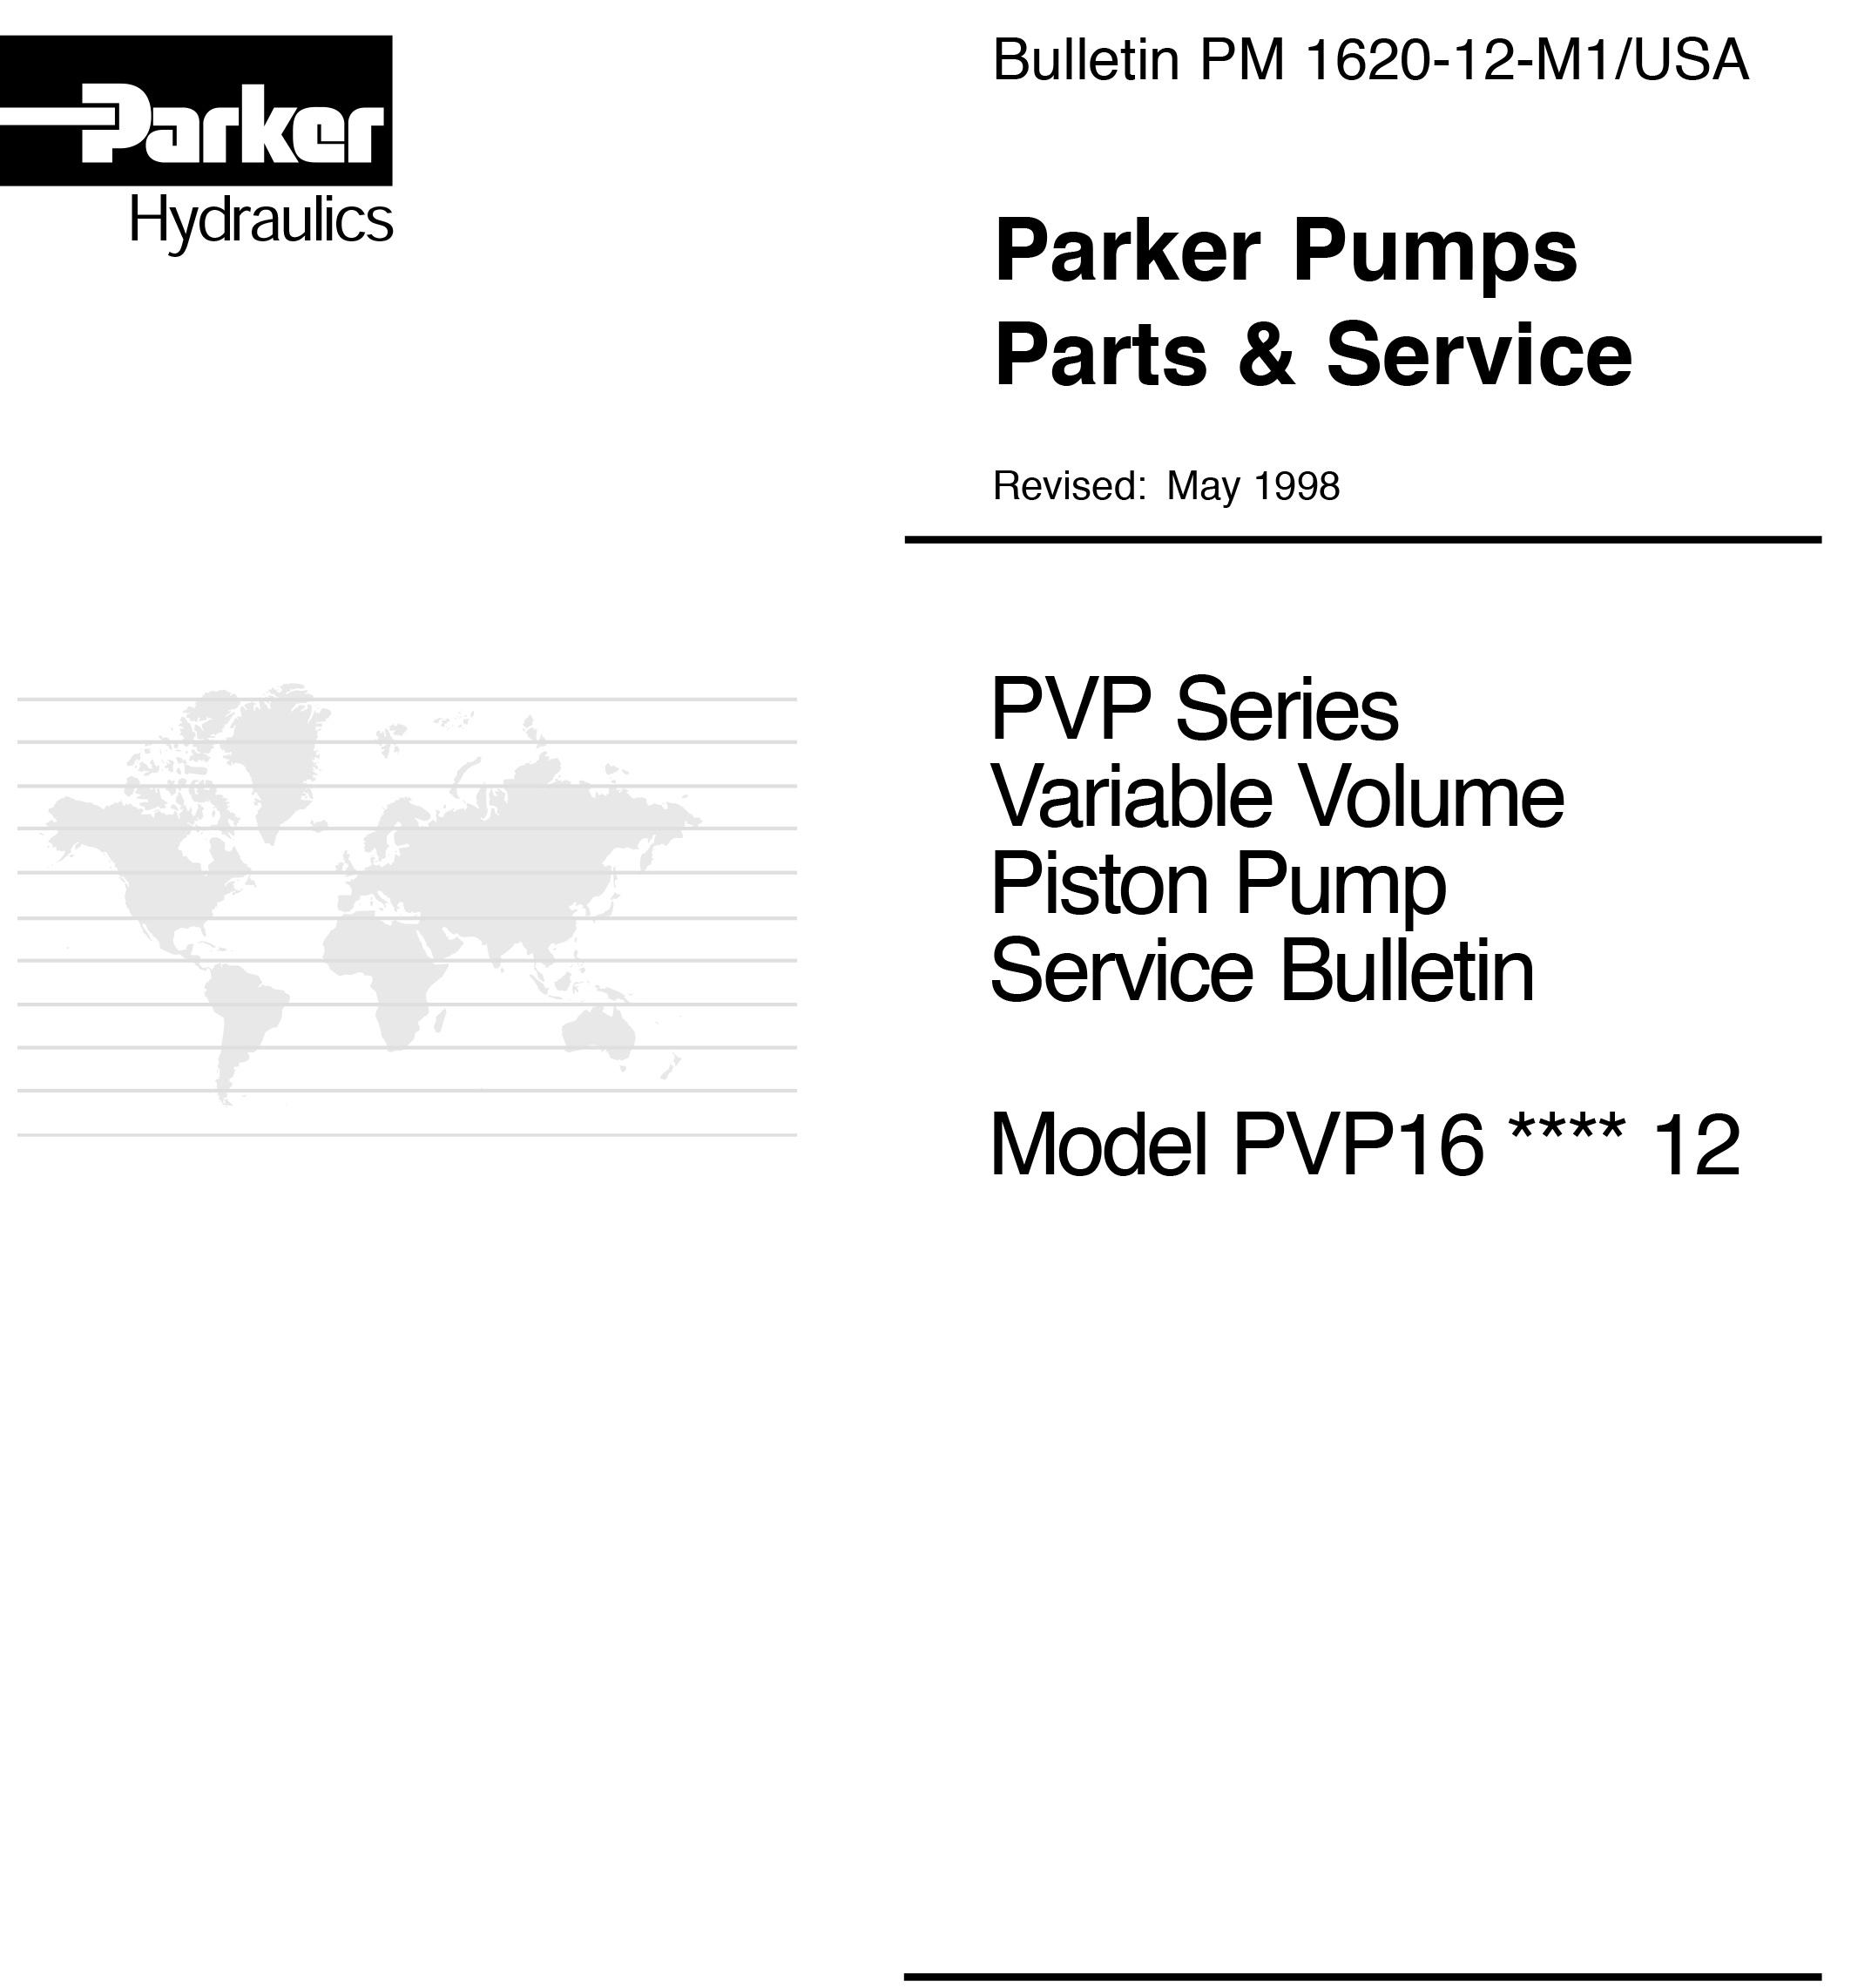 oem-parker-pvp-breakdown.jpg